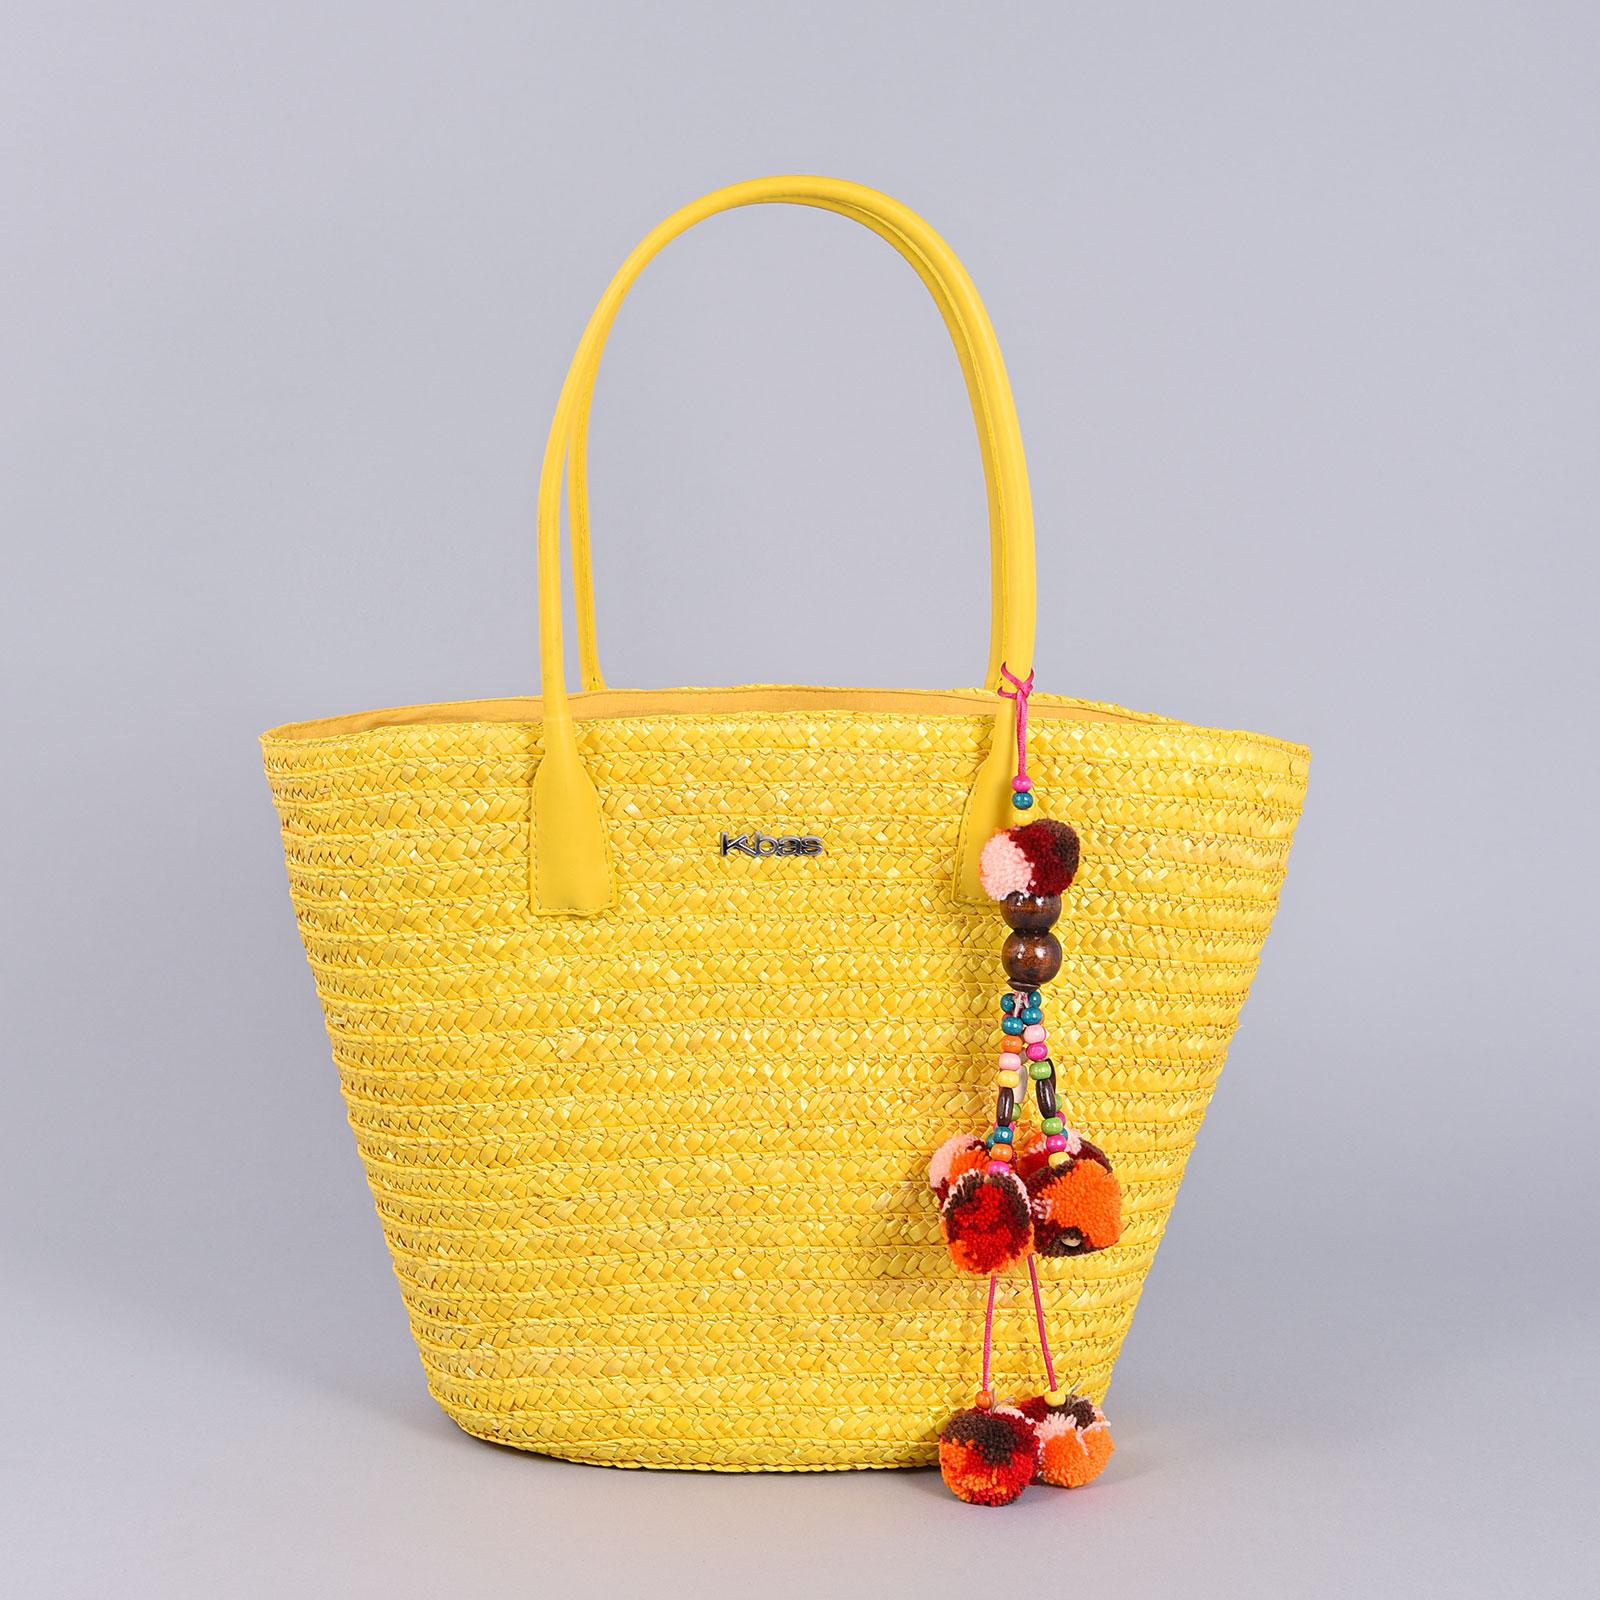 MQ-00116-jaune-F16-sac-de-plage-cabas